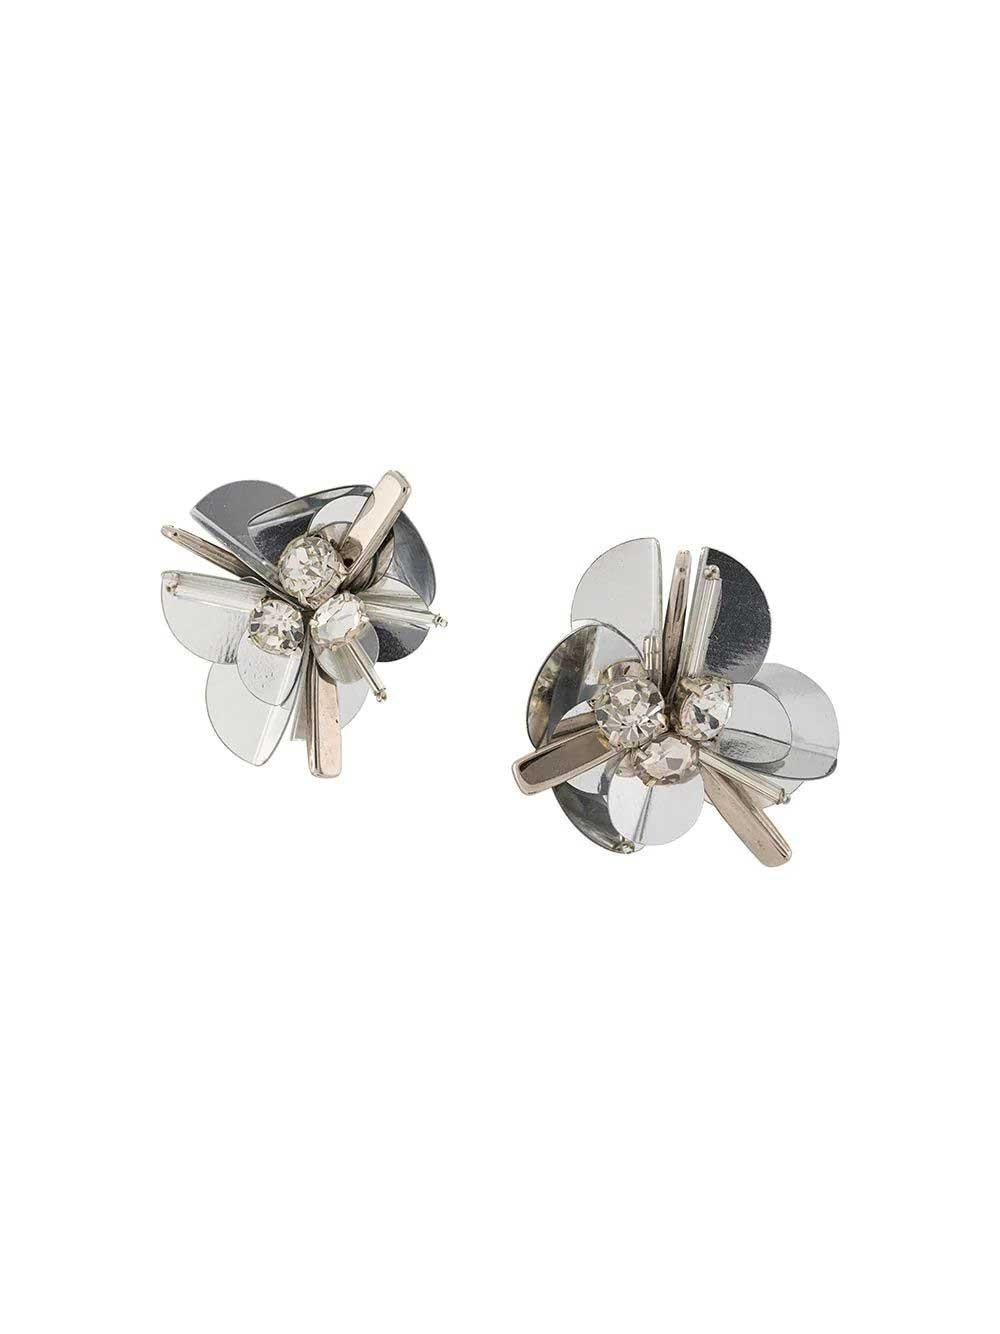 Haley Stud Earrings Item # E185-050